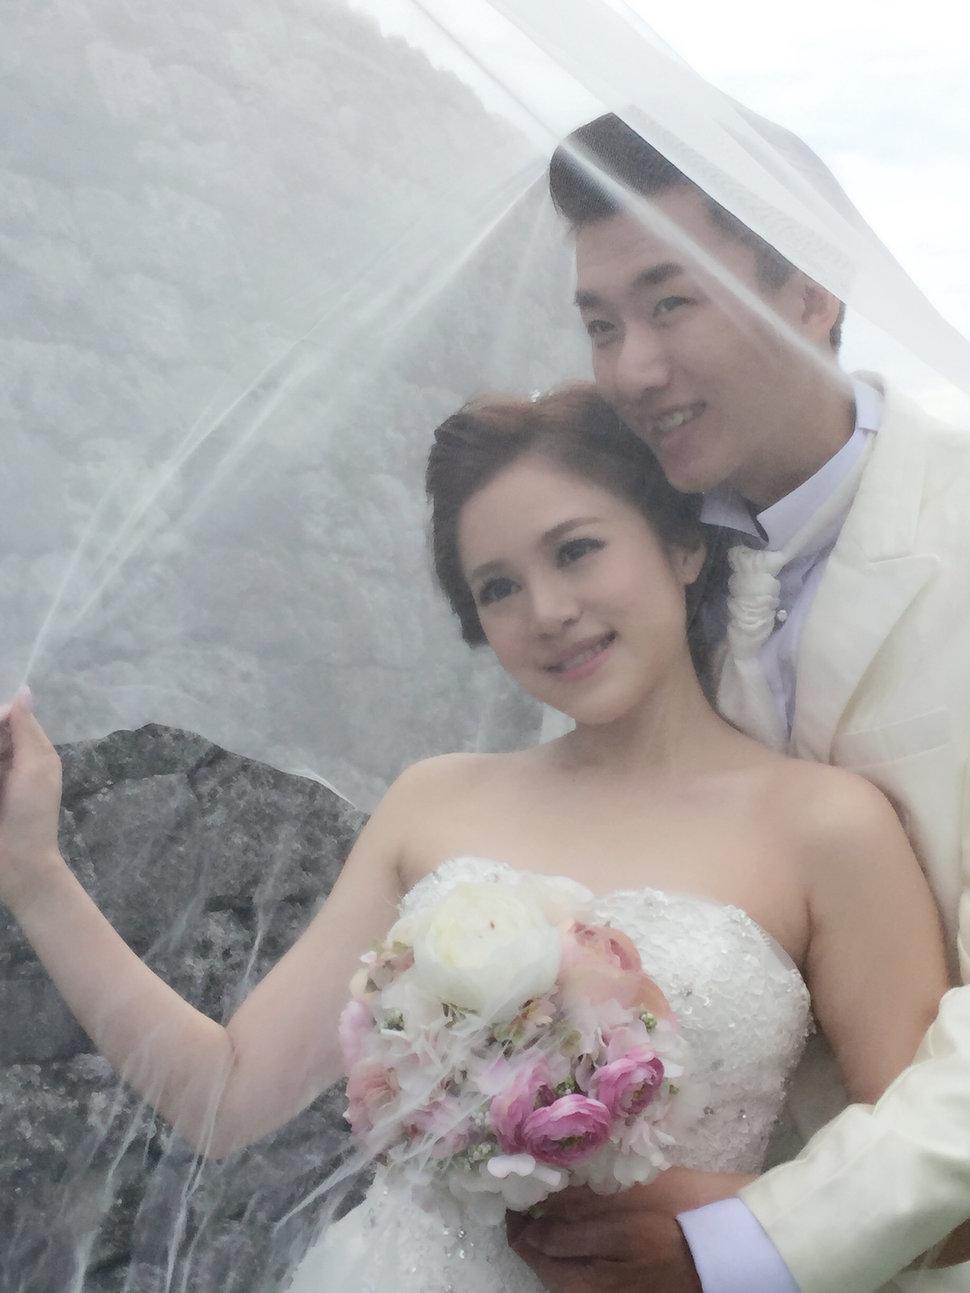 IMG_3240 - Jojo chen Makeup新娘秘書《結婚吧》